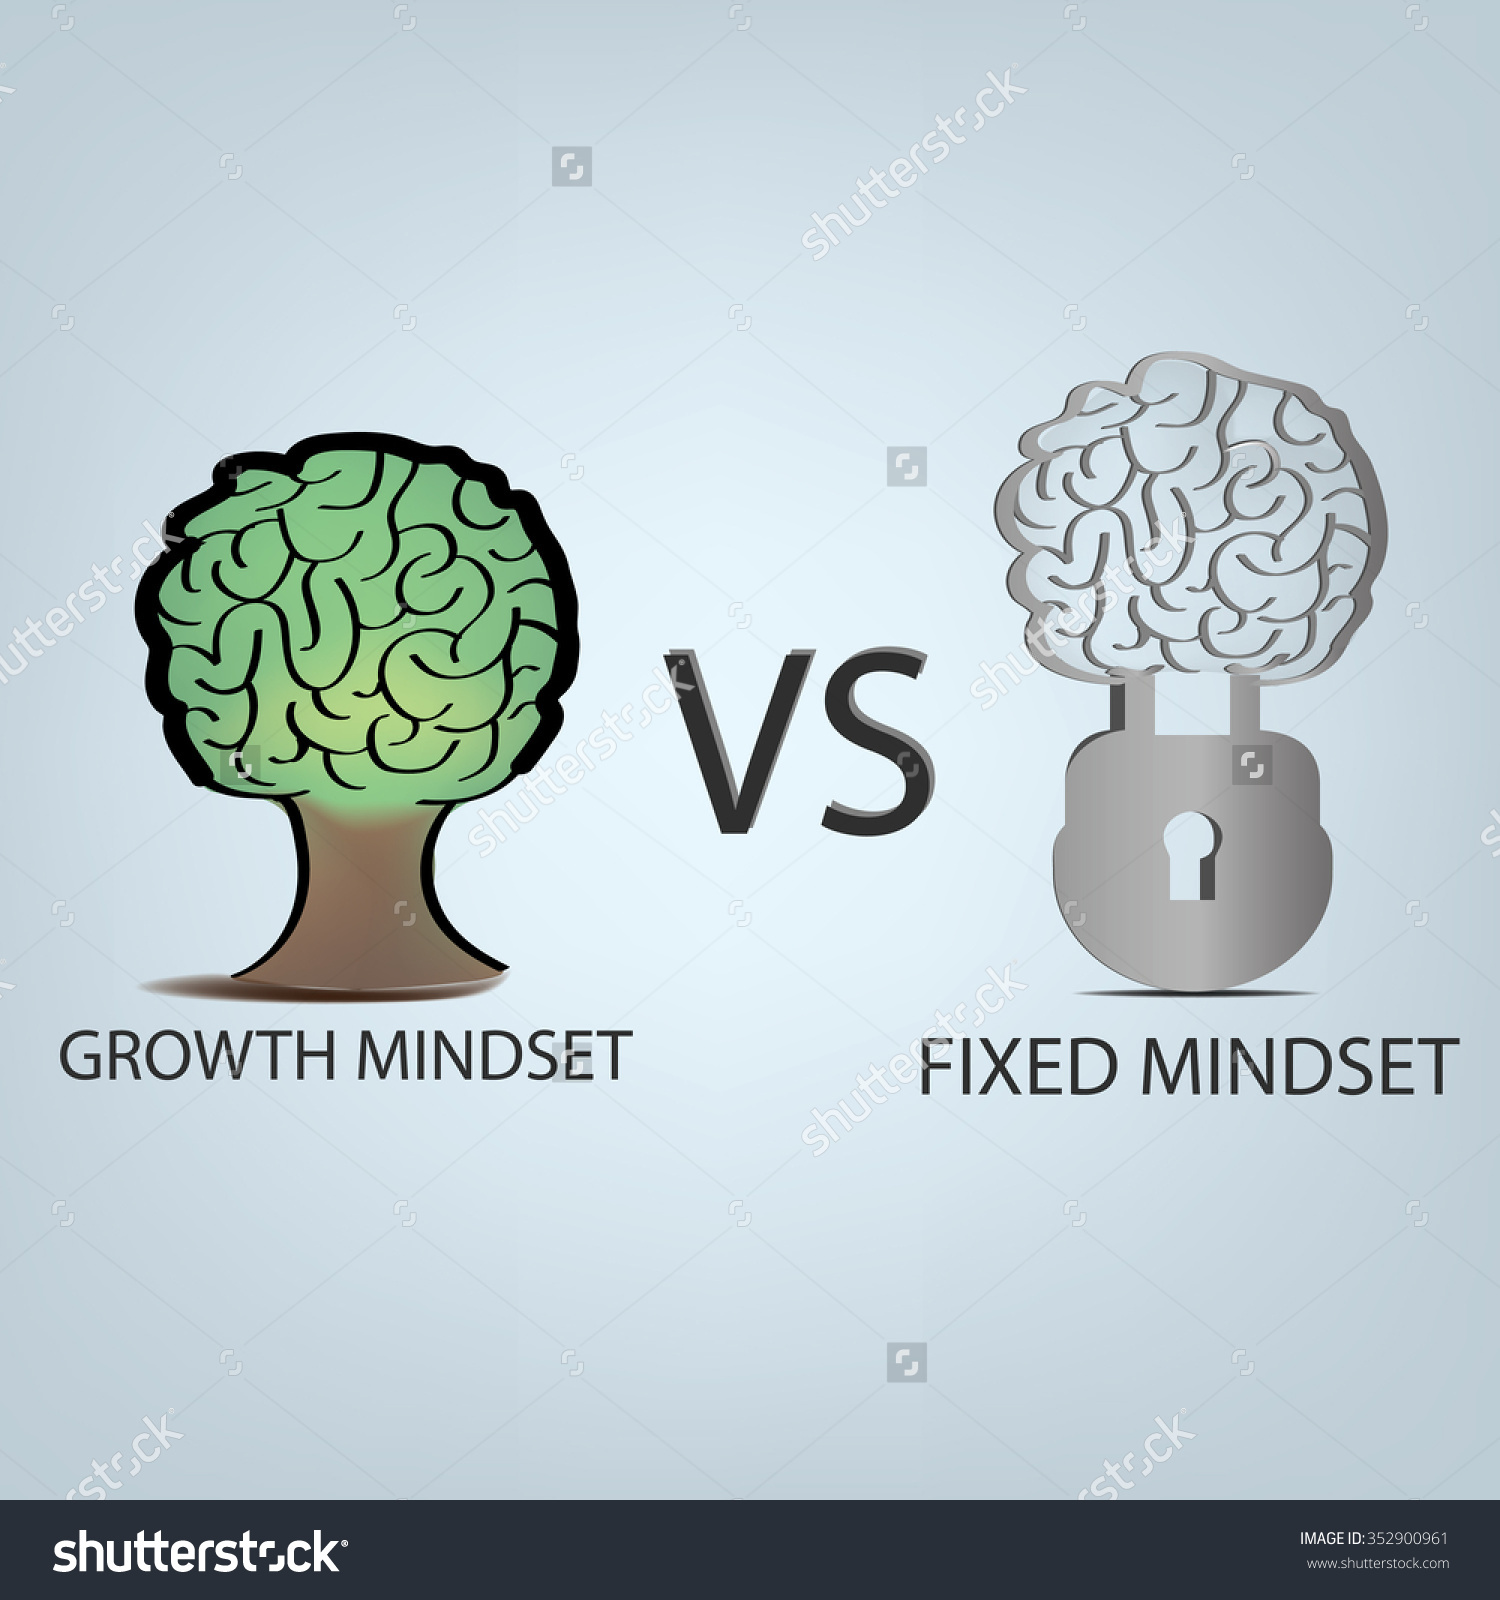 Growth mindset clipart.